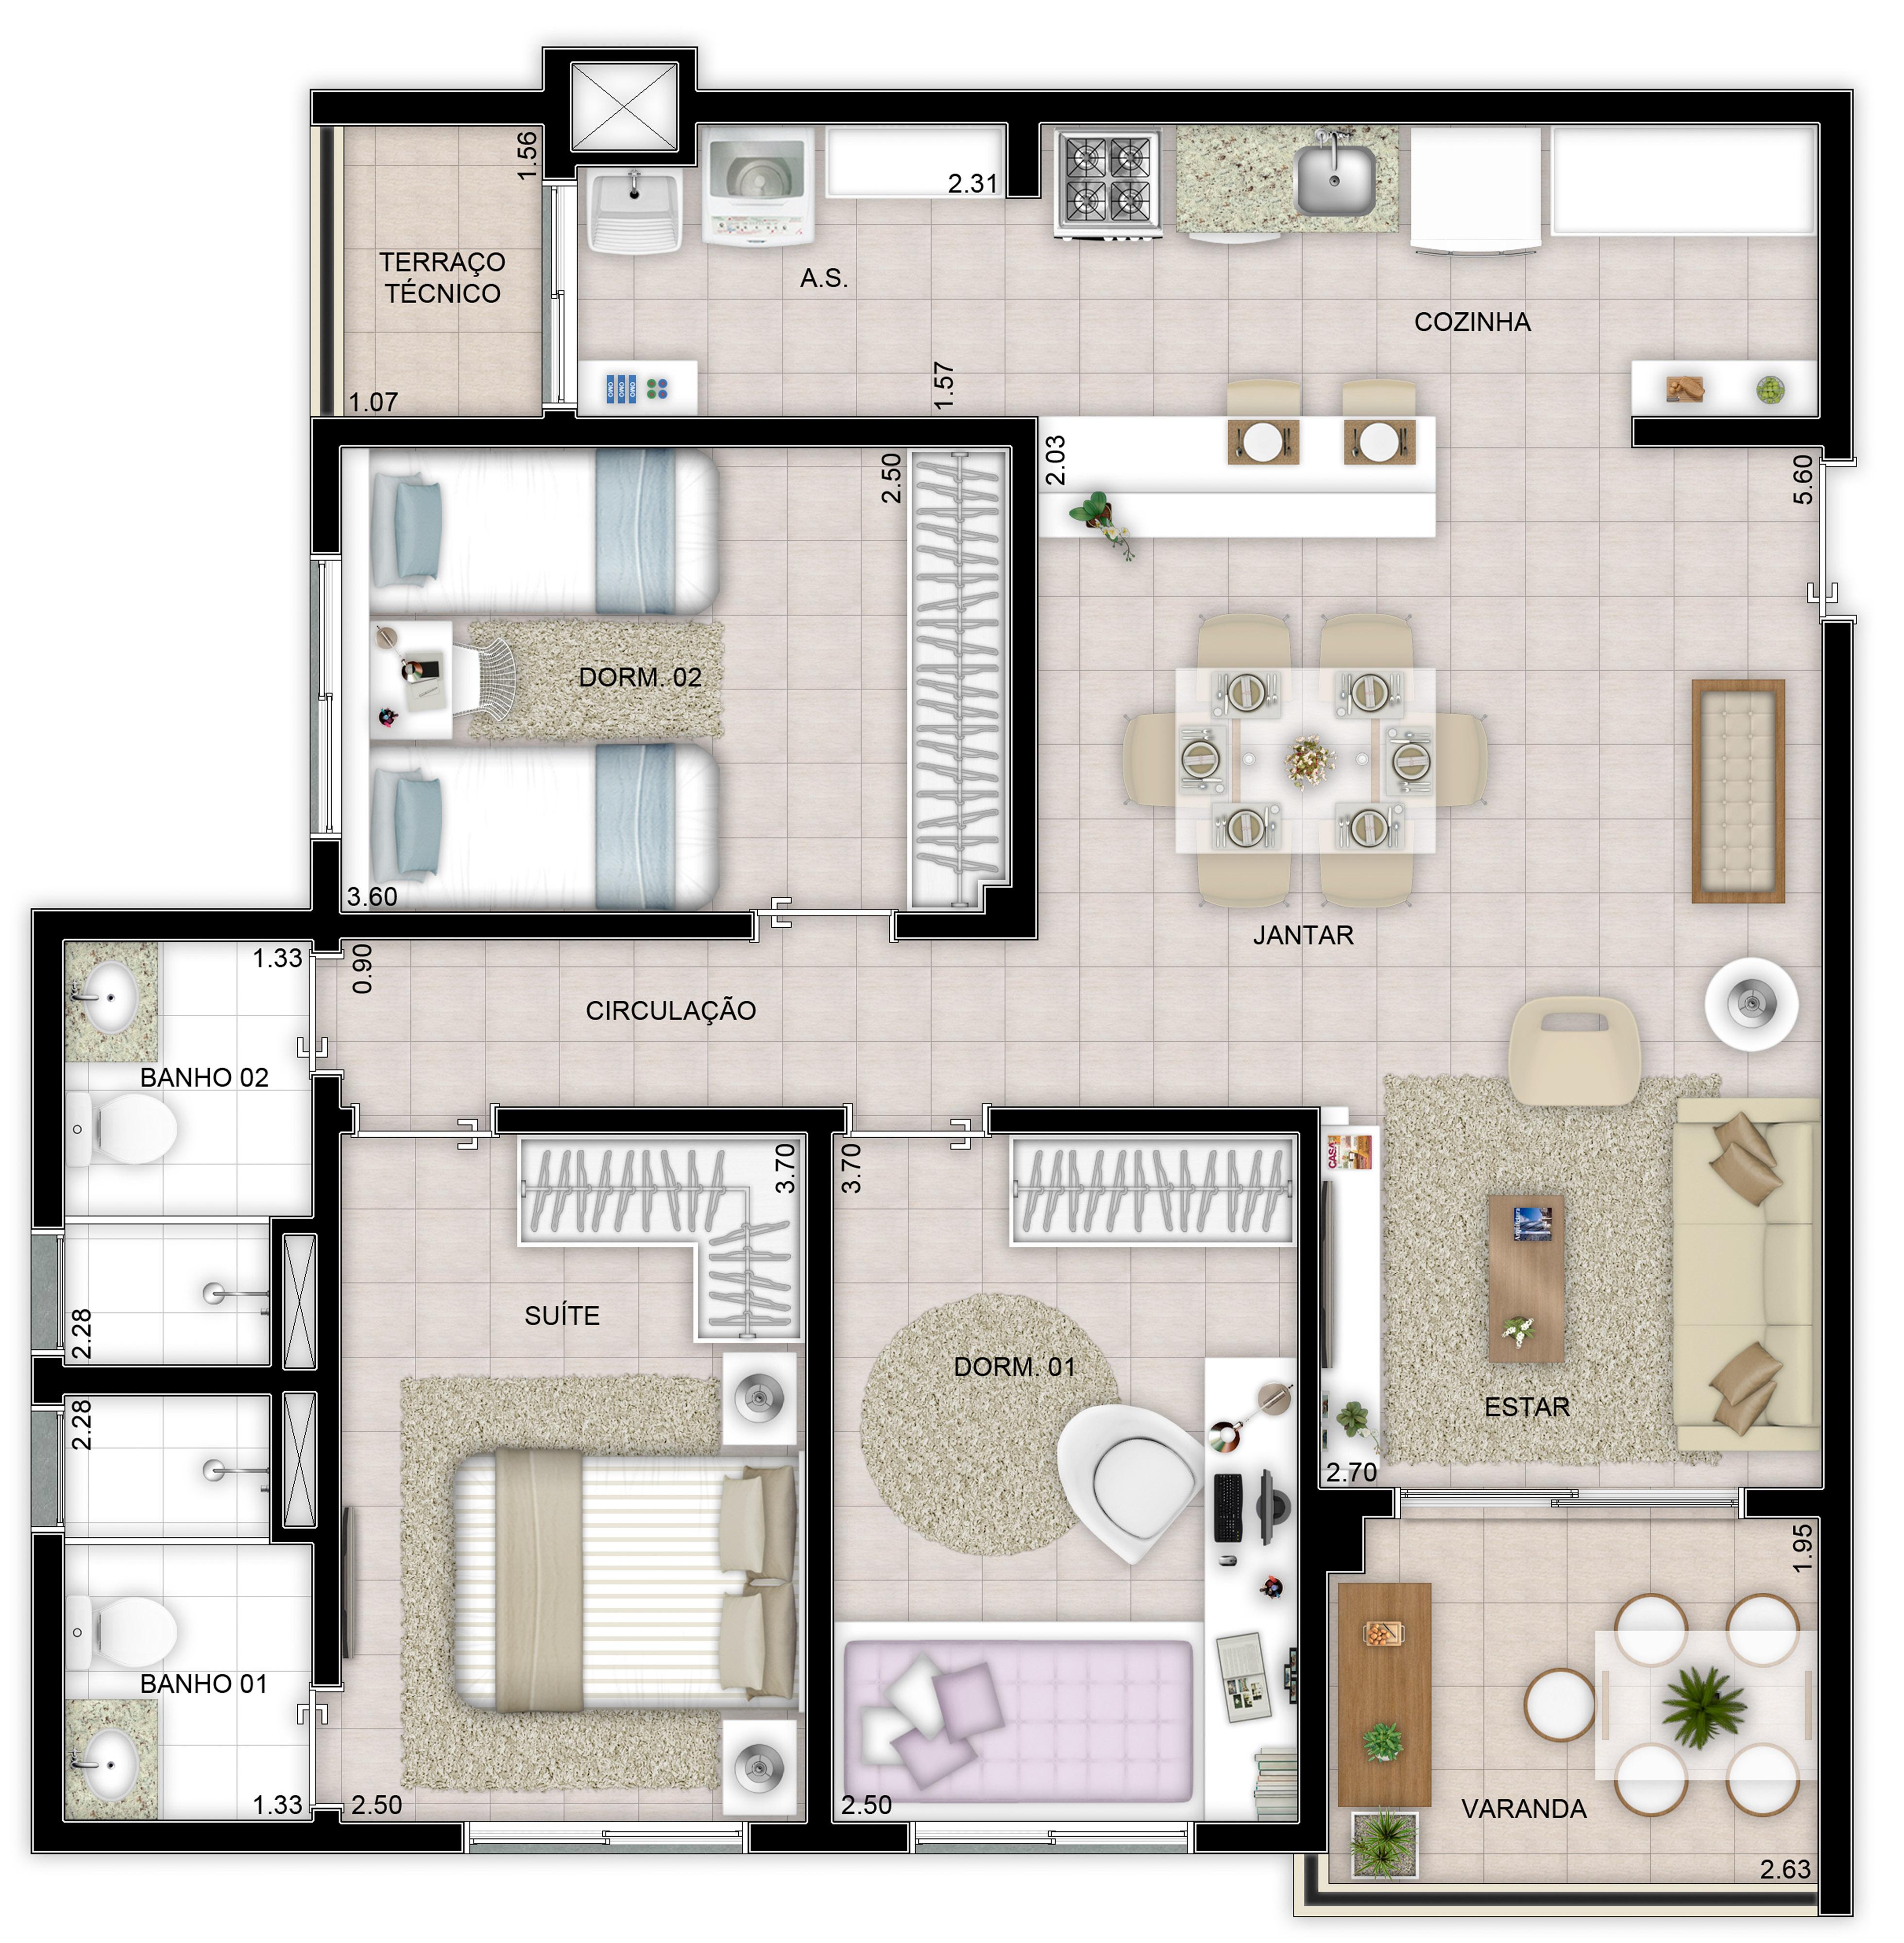 85m² - 3 dorms